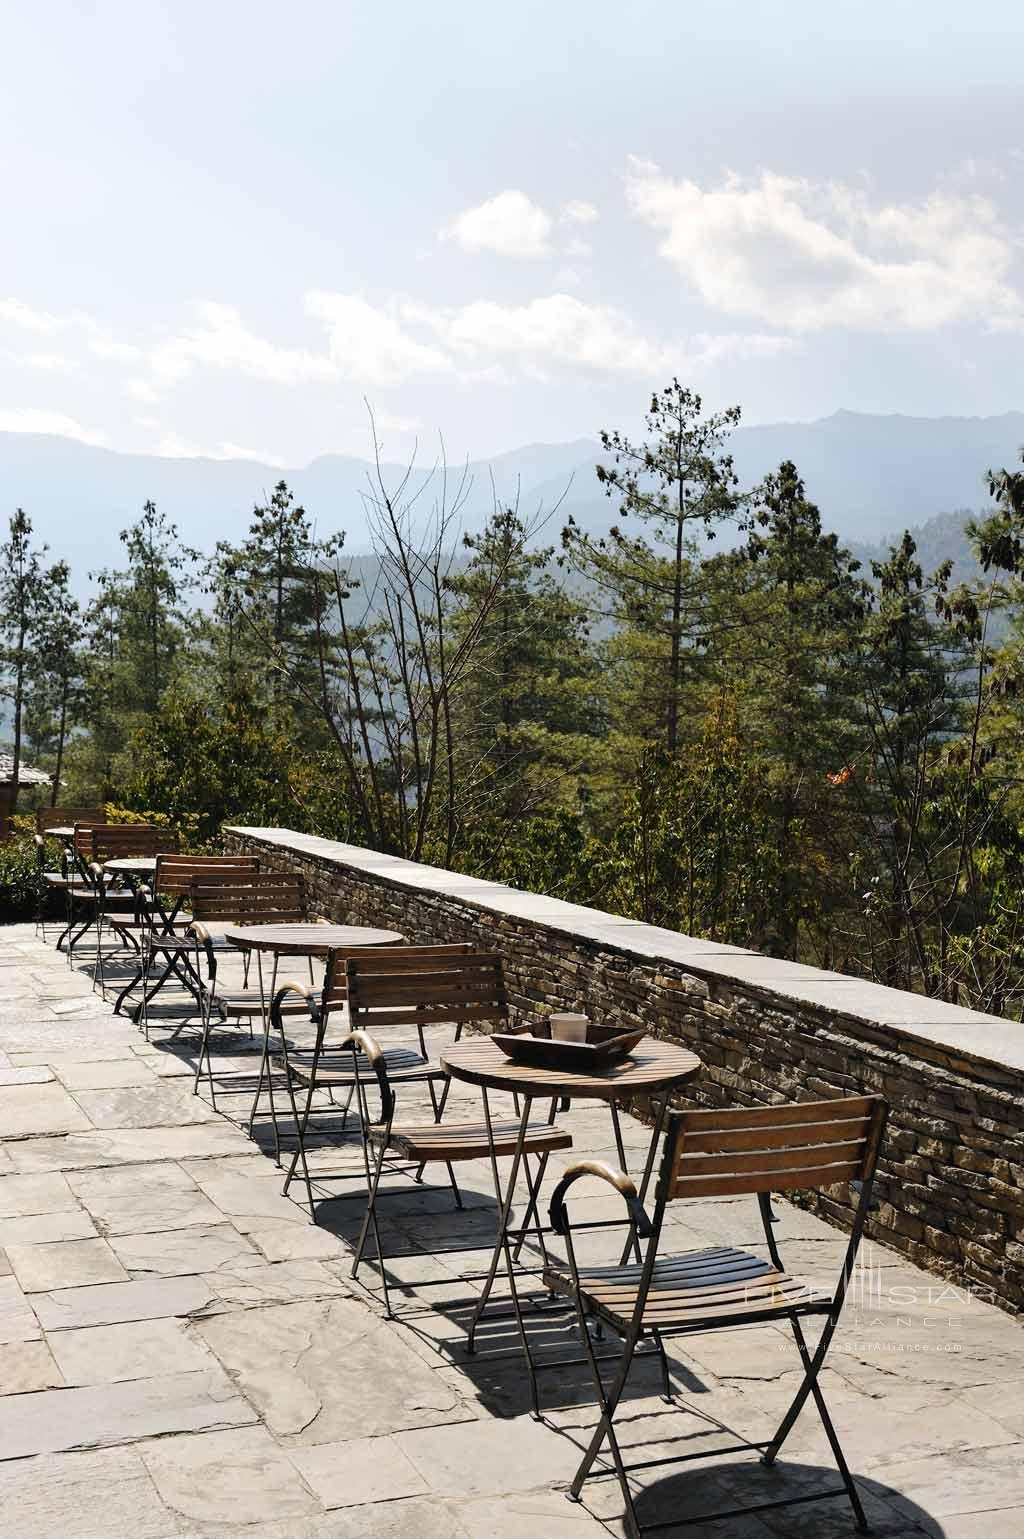 Terrace Lounge at COMO Uma Paro, Paro, Bhutan